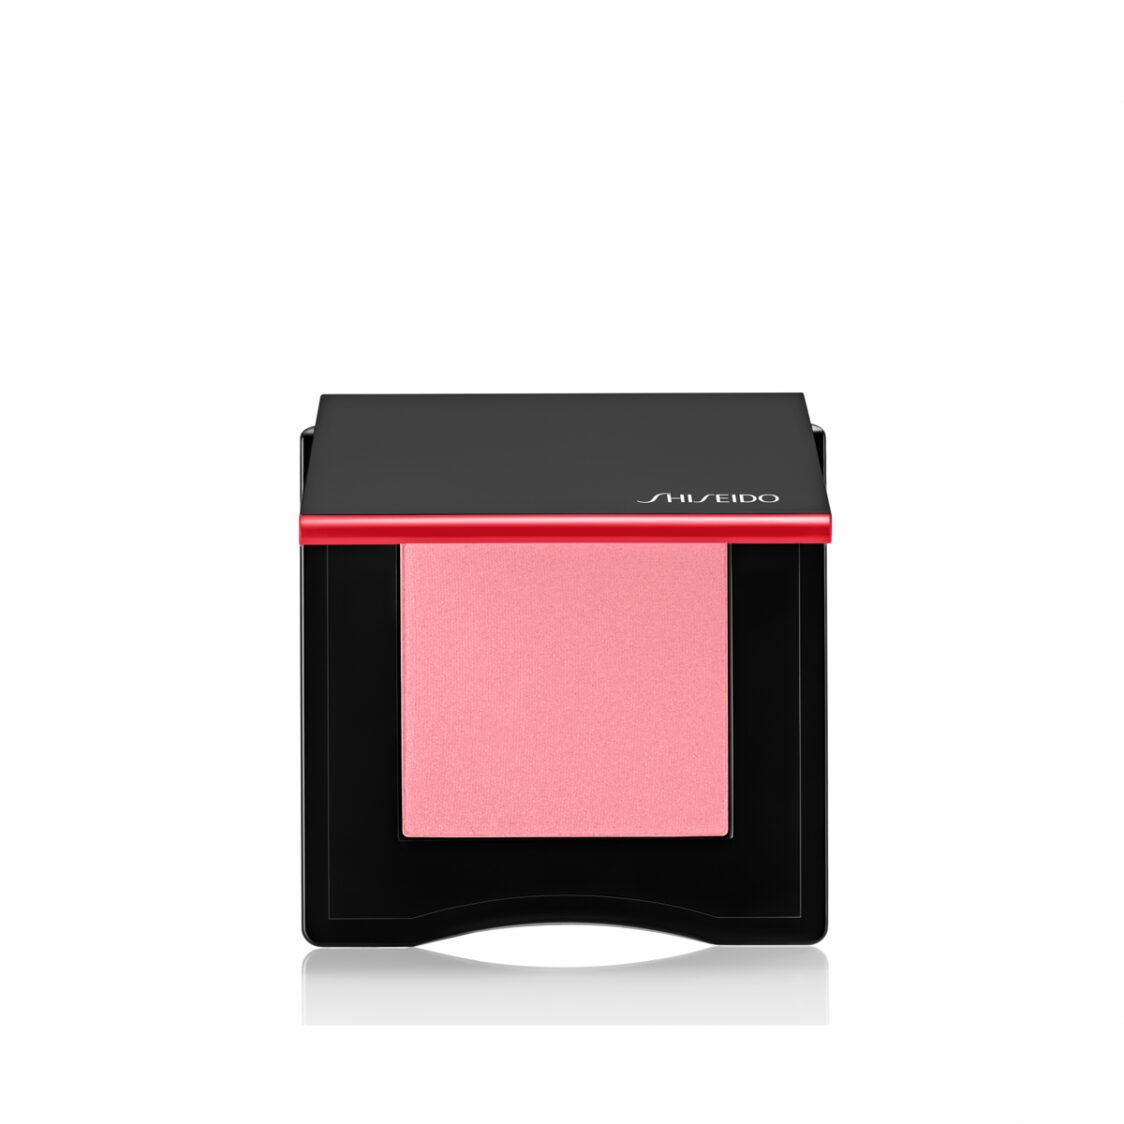 Shiseido Makeup InnerGlow CheekPowder